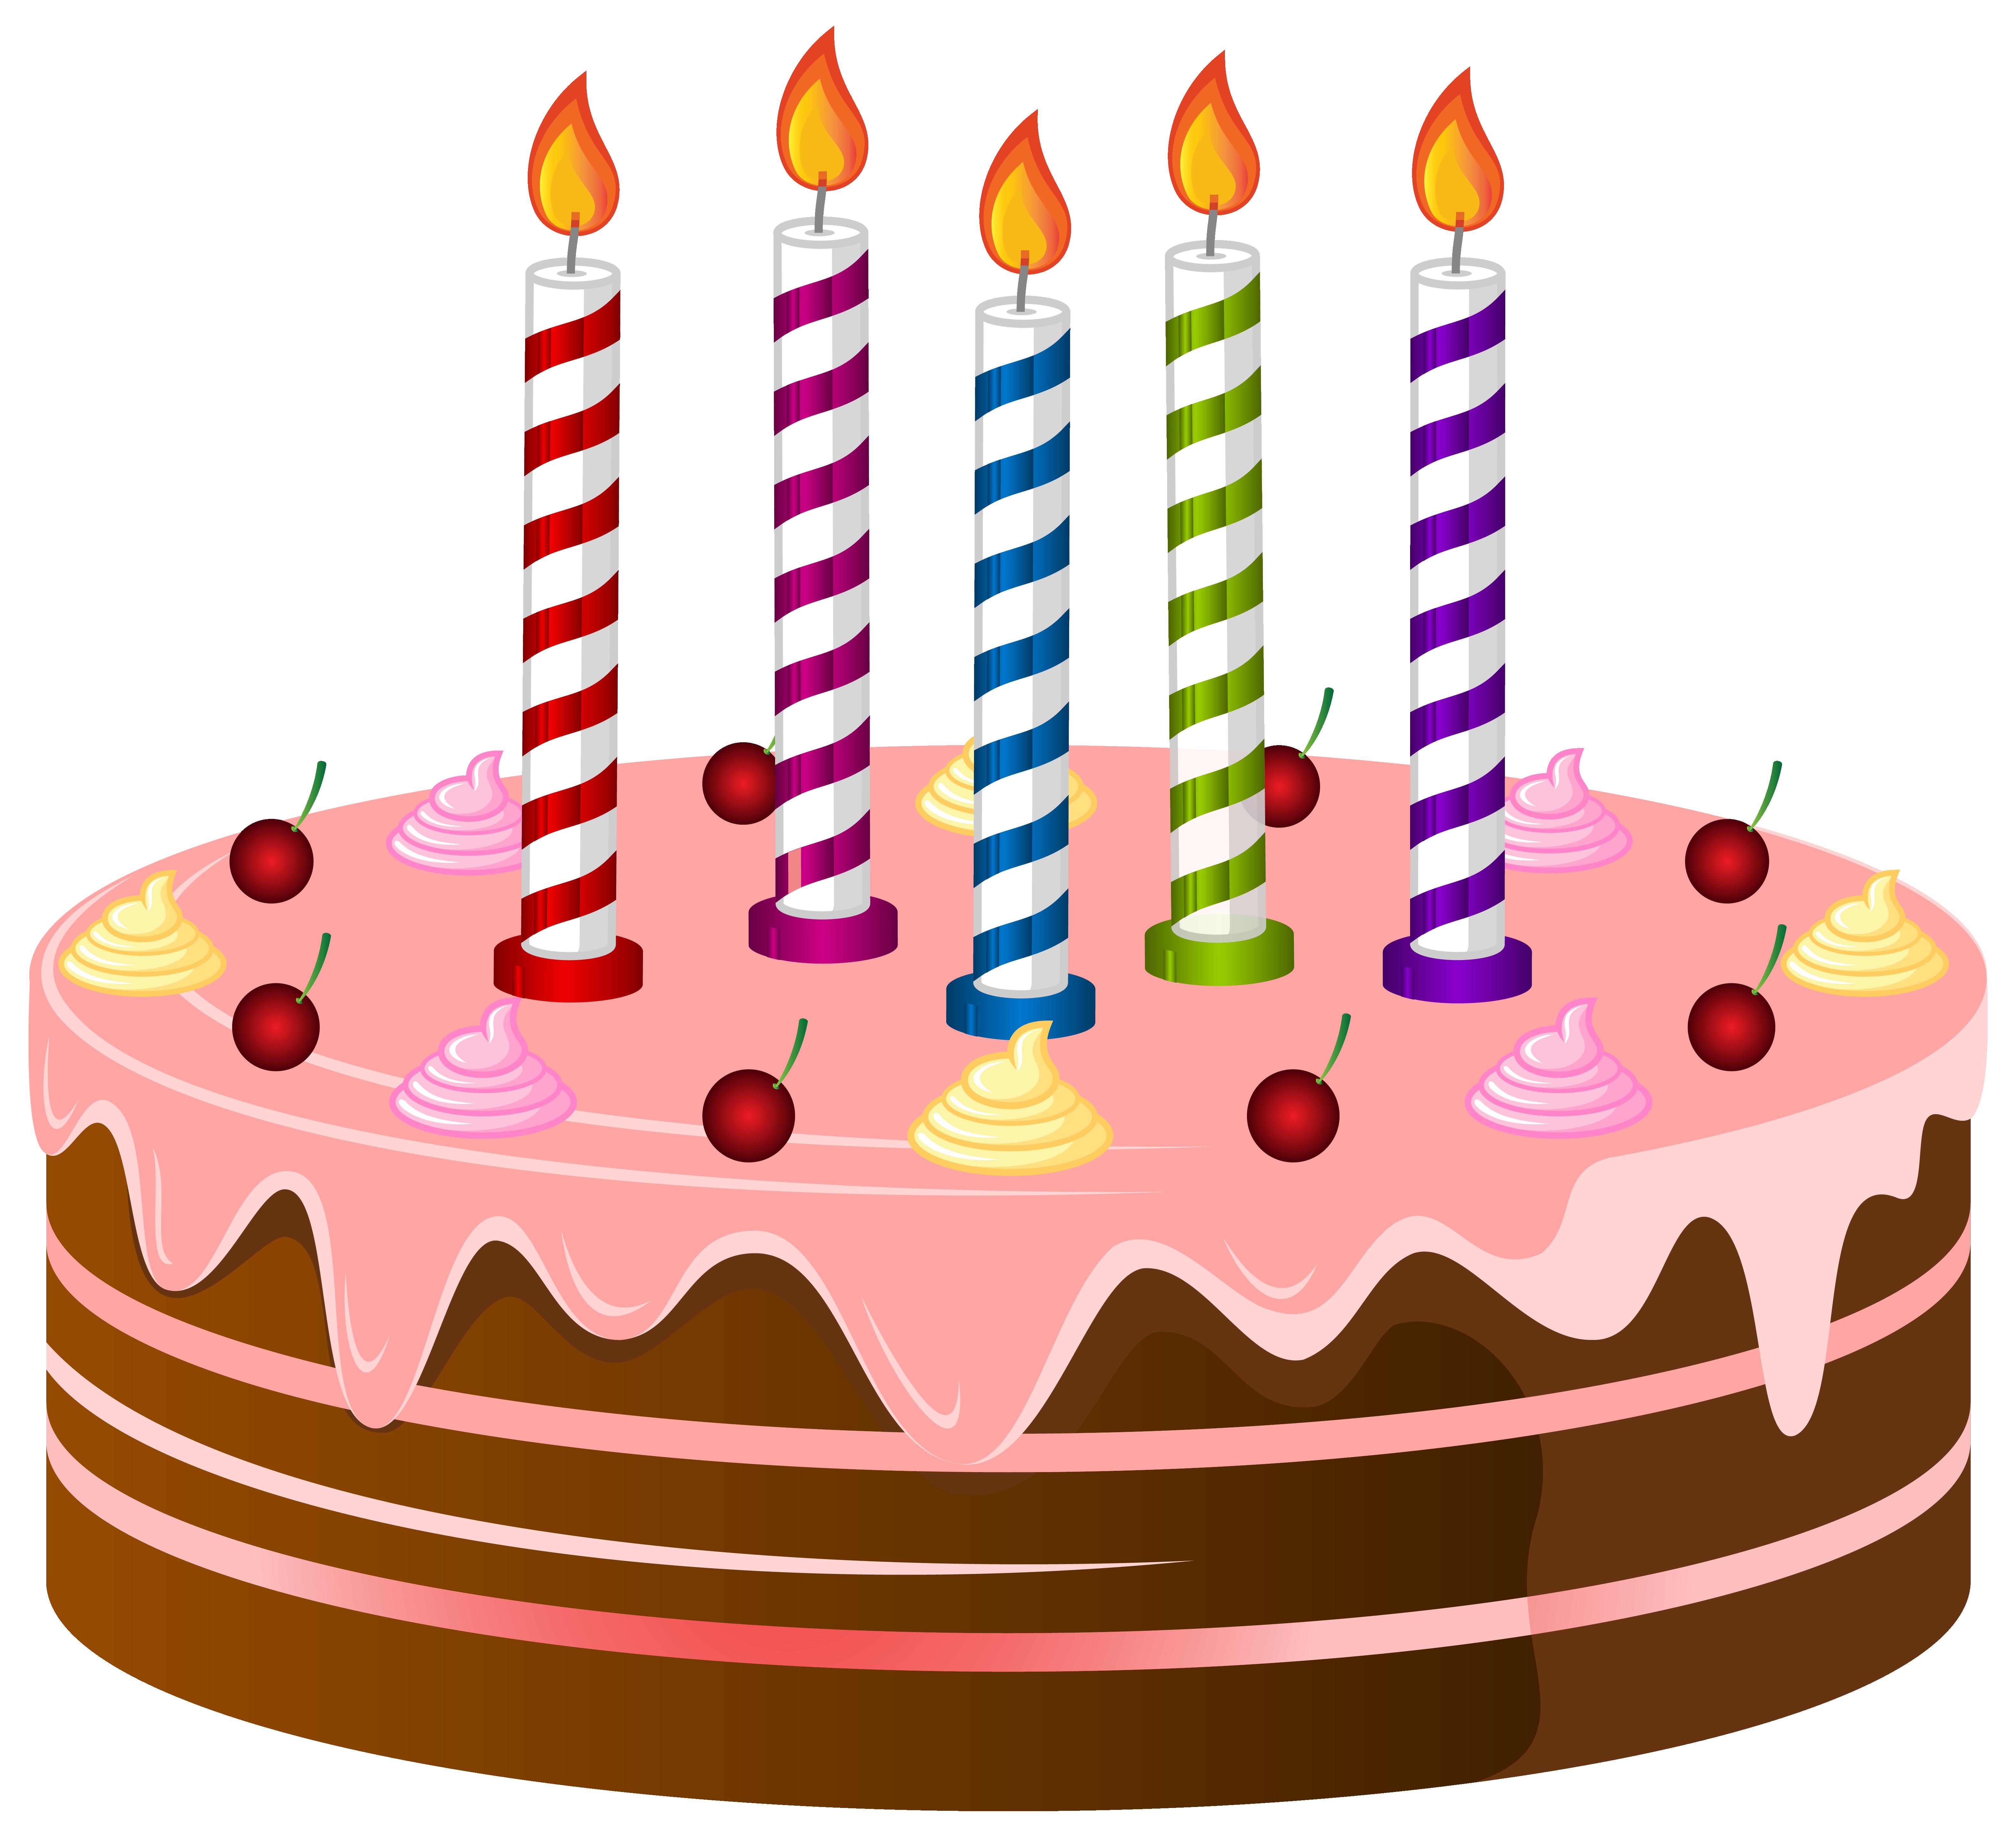 6315x5754 Birthday Cake PNG Clip Art Imageu200b Gallery Yopriceville